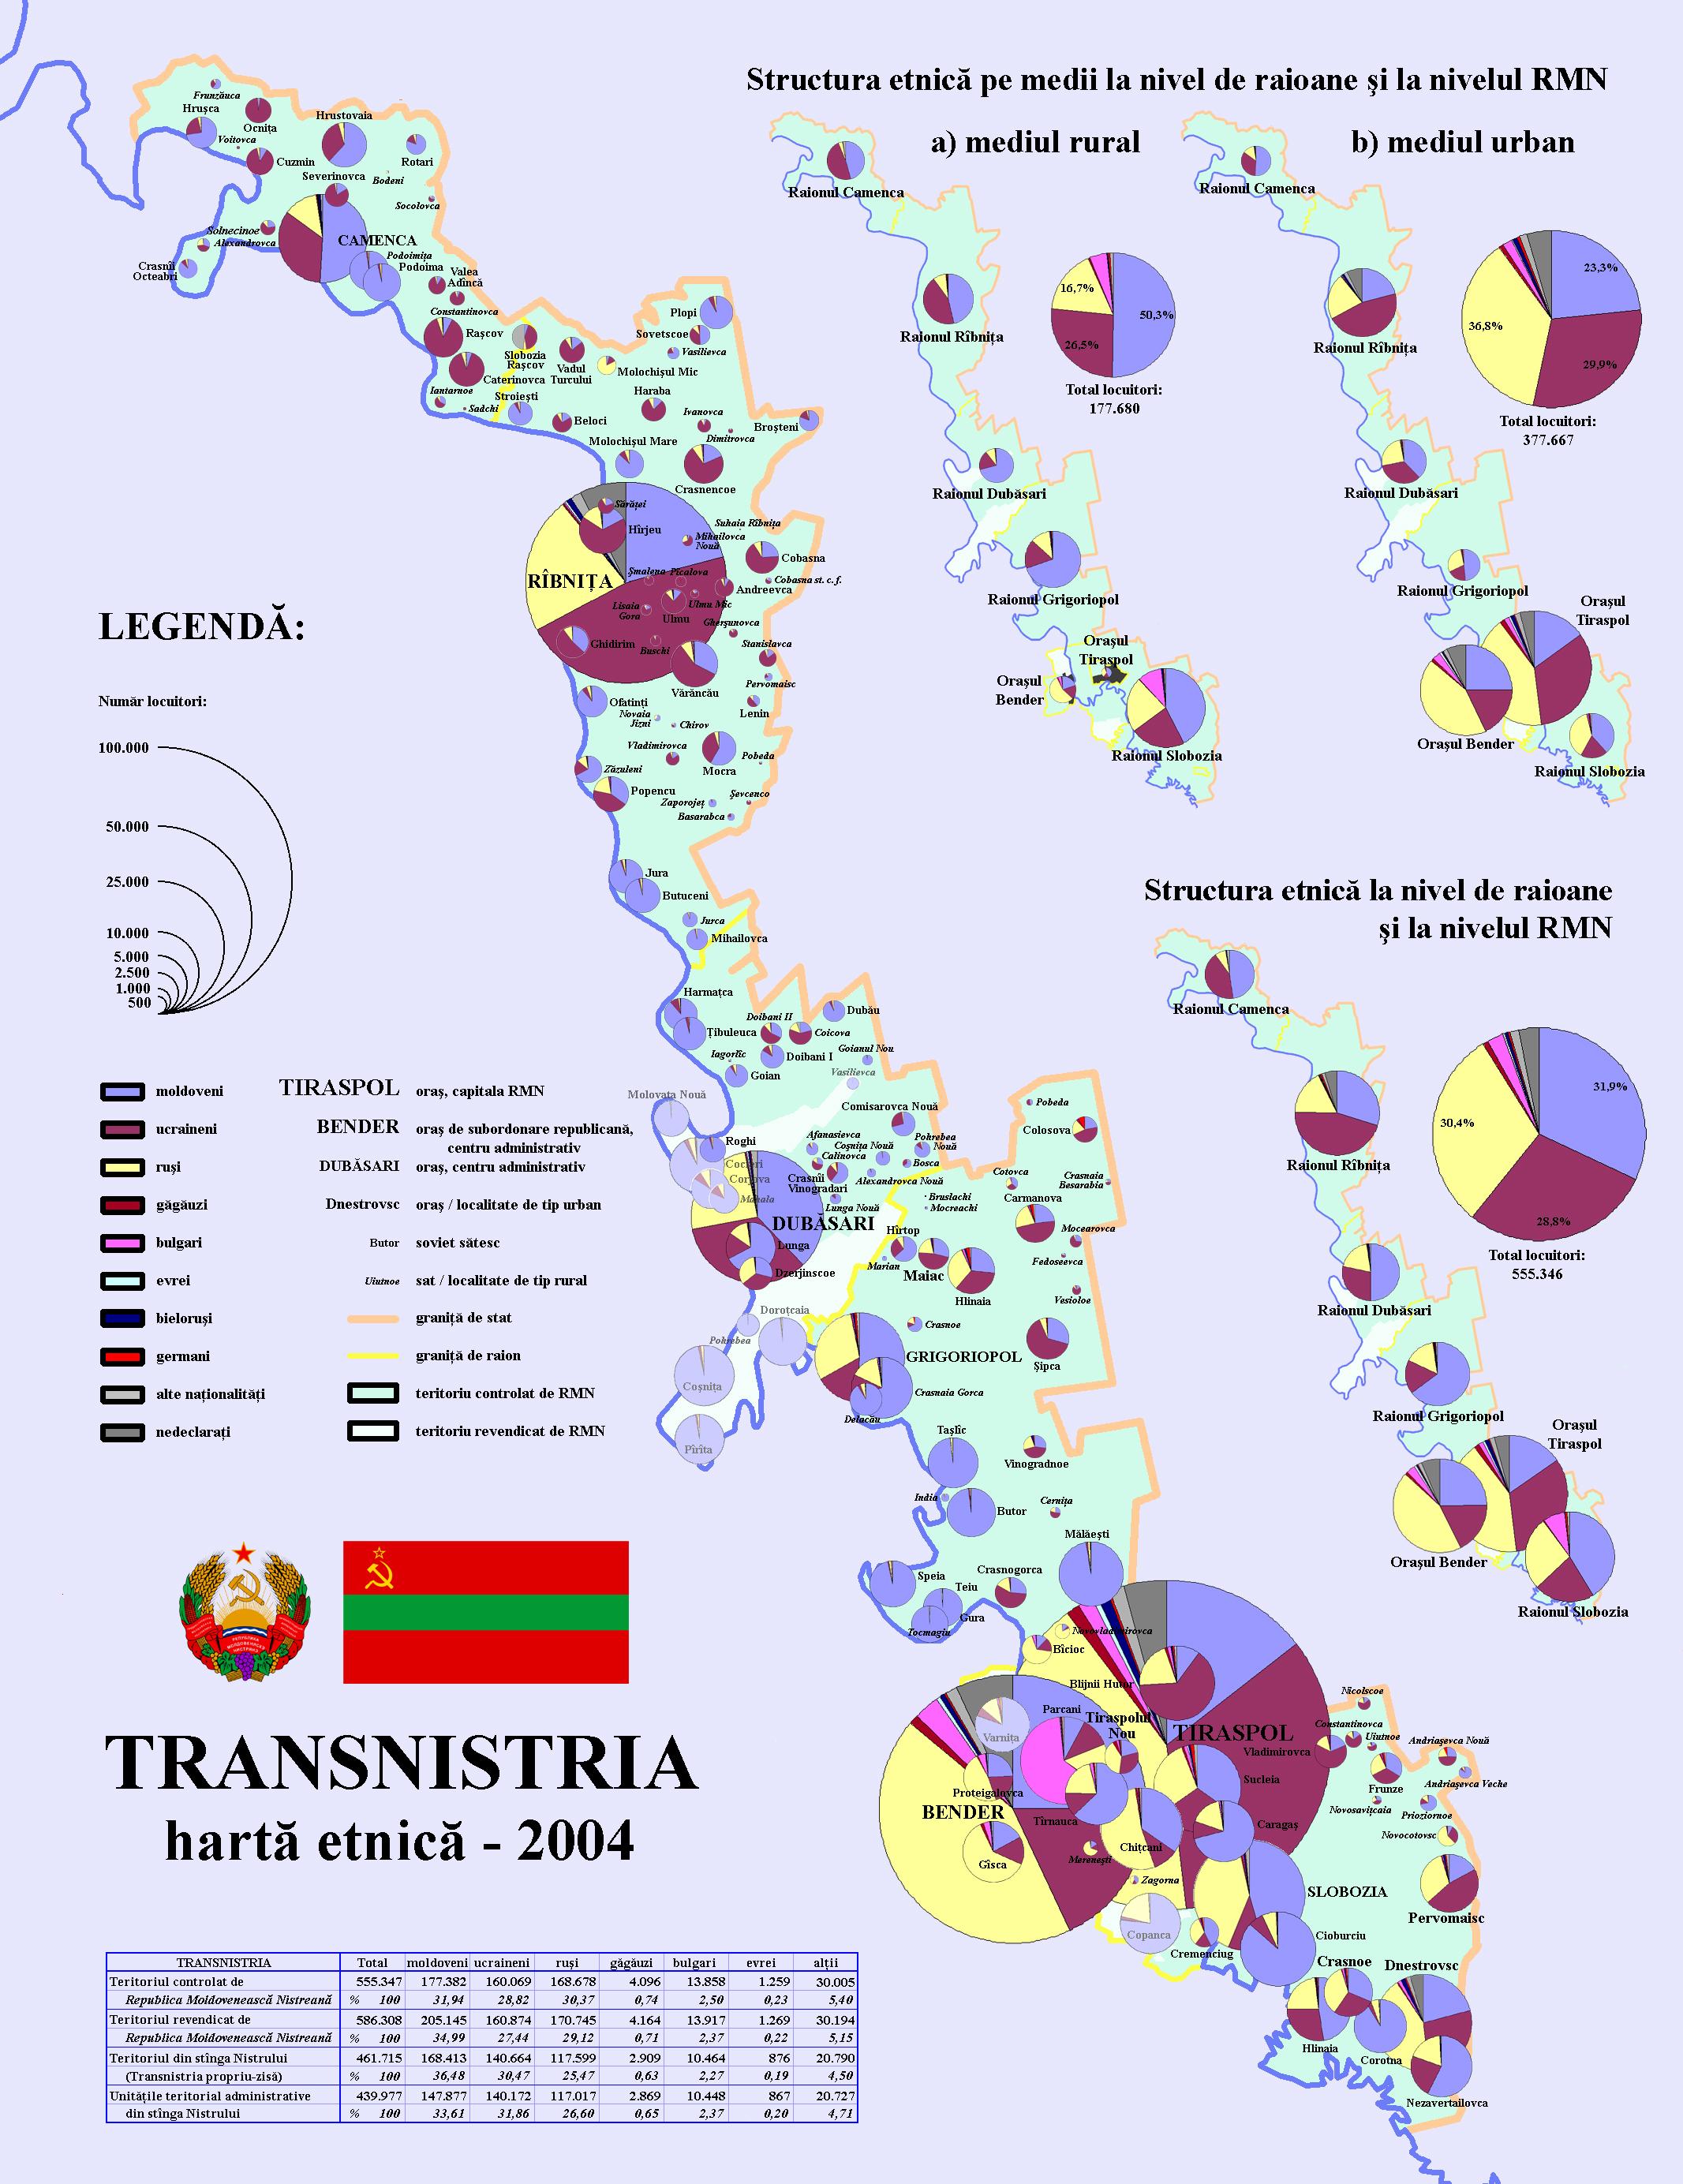 FileTransnistriaharta Etnica Jpg Wikimedia Commons - Transnistria map